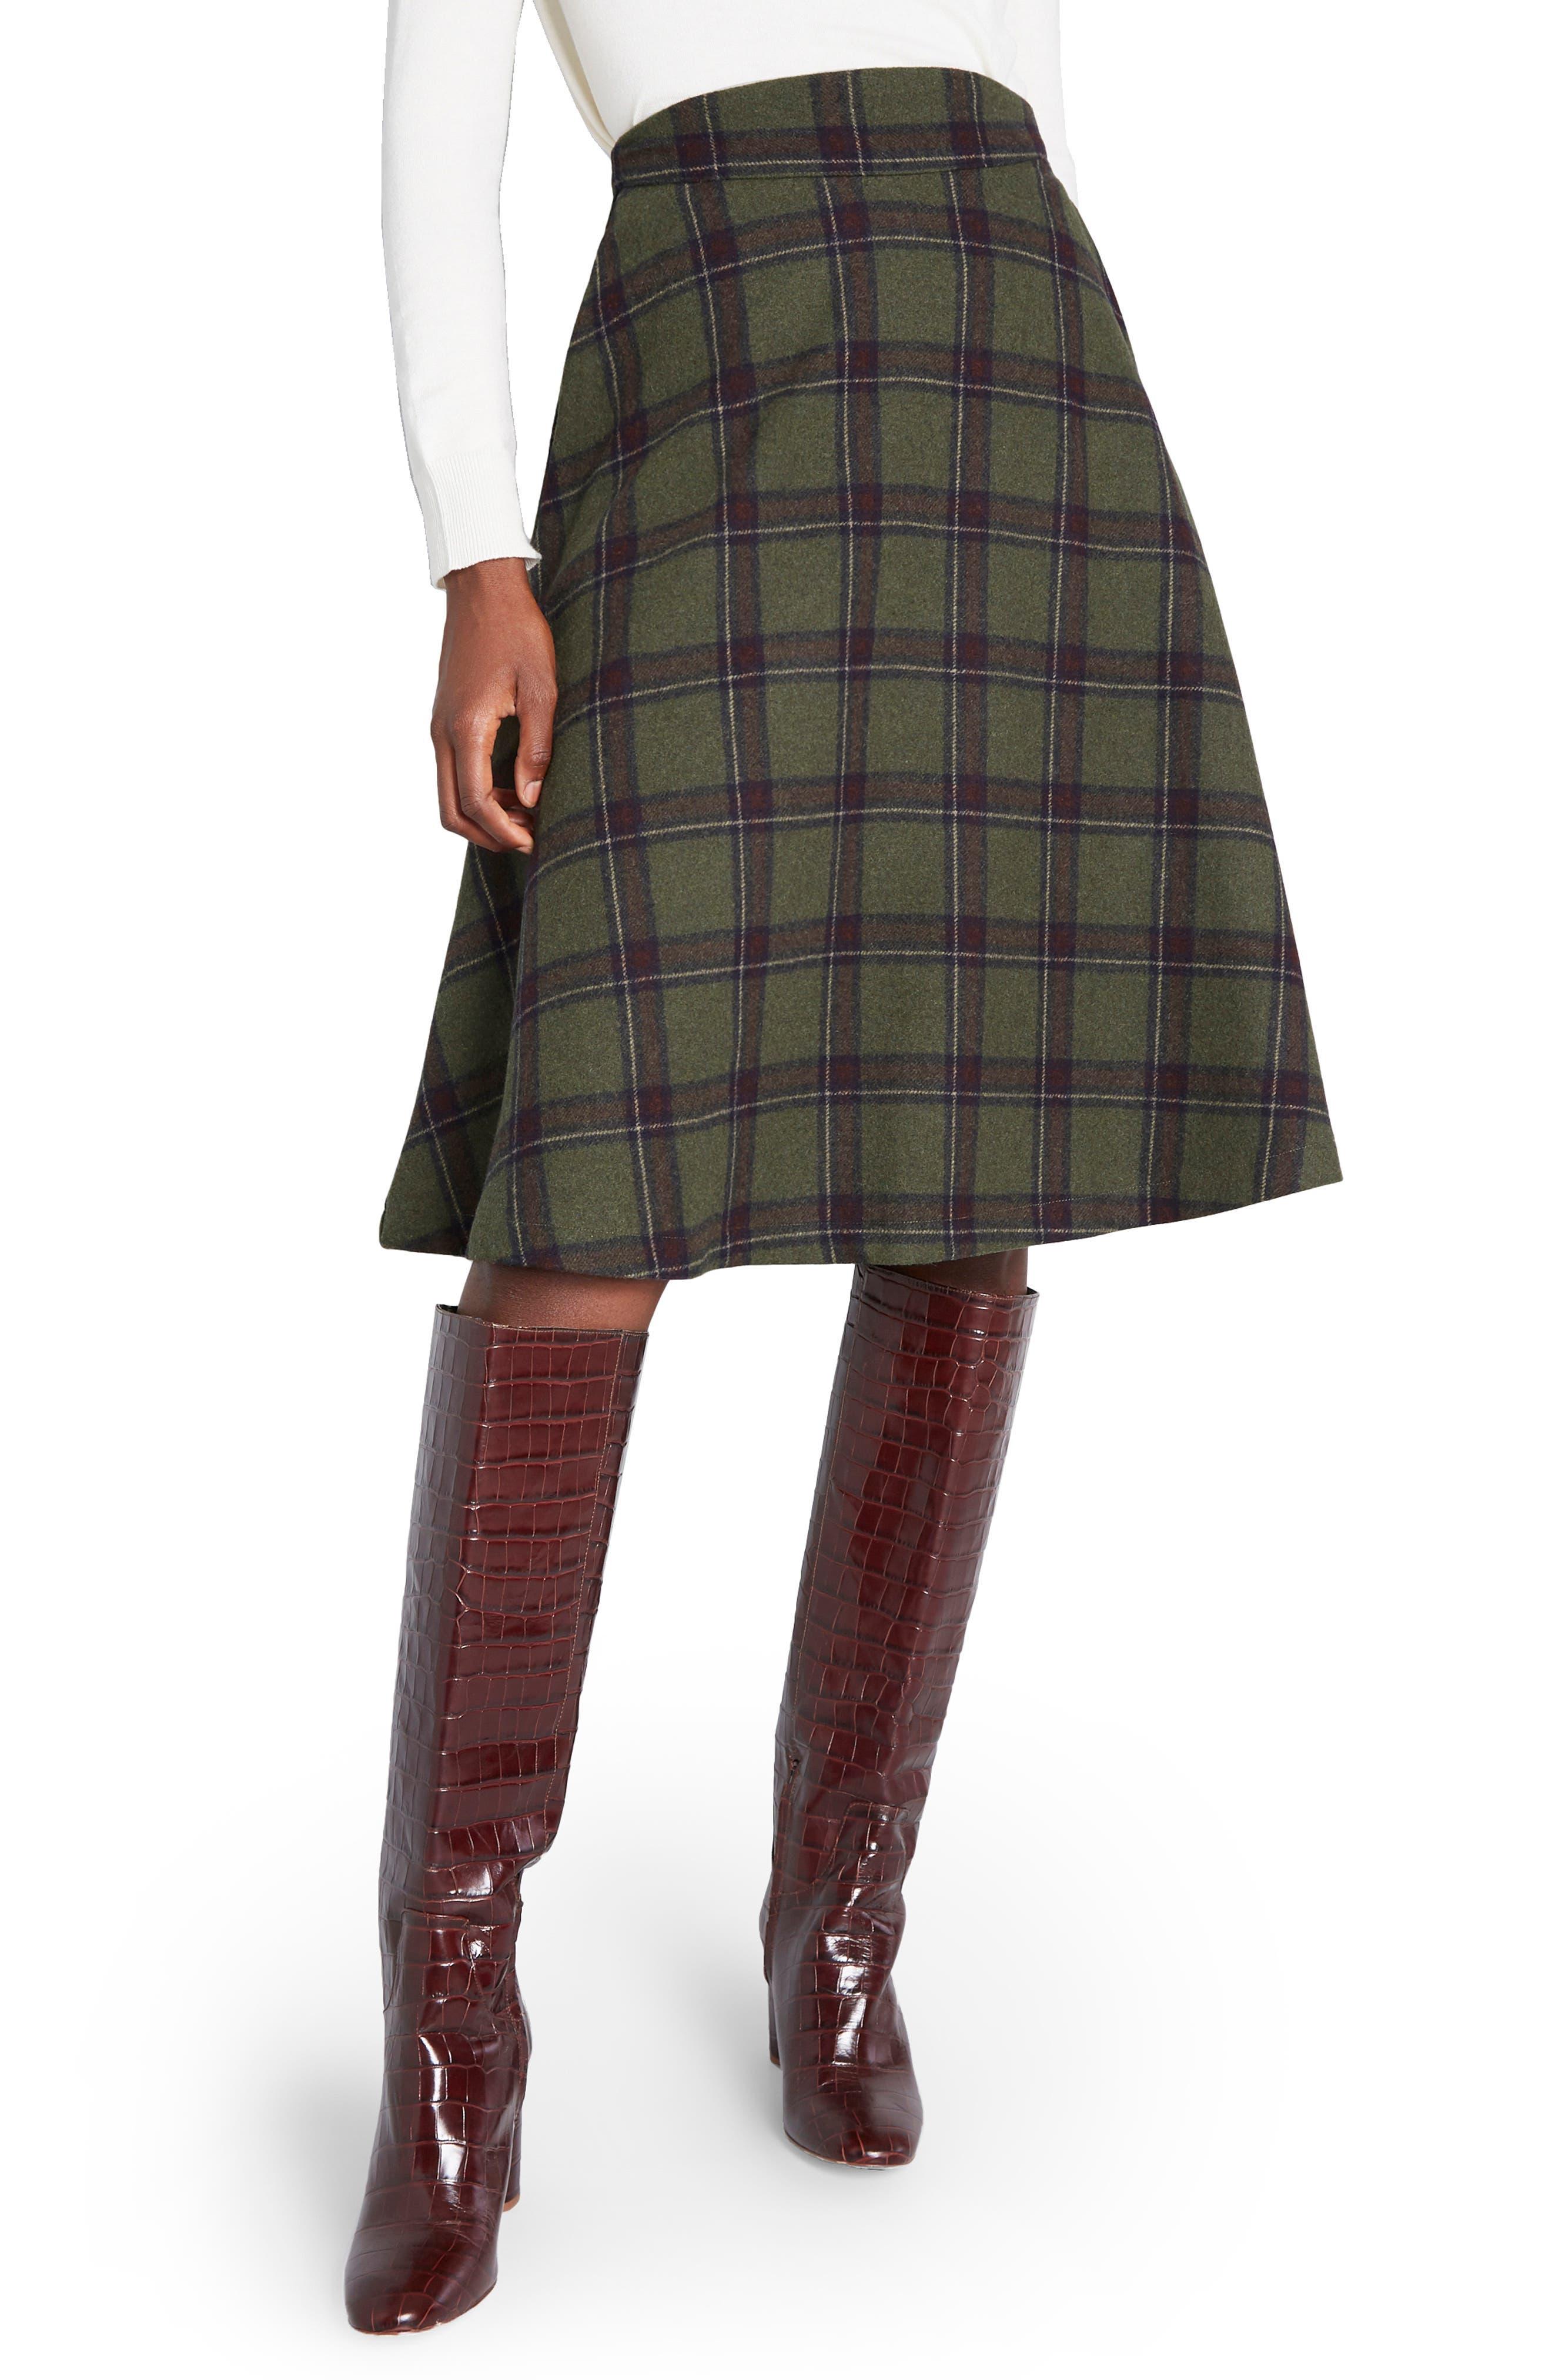 1940s Teenage Fashion: Girls Womens Modcloth Prim Class Hero Plaid Skirt $69.00 AT vintagedancer.com